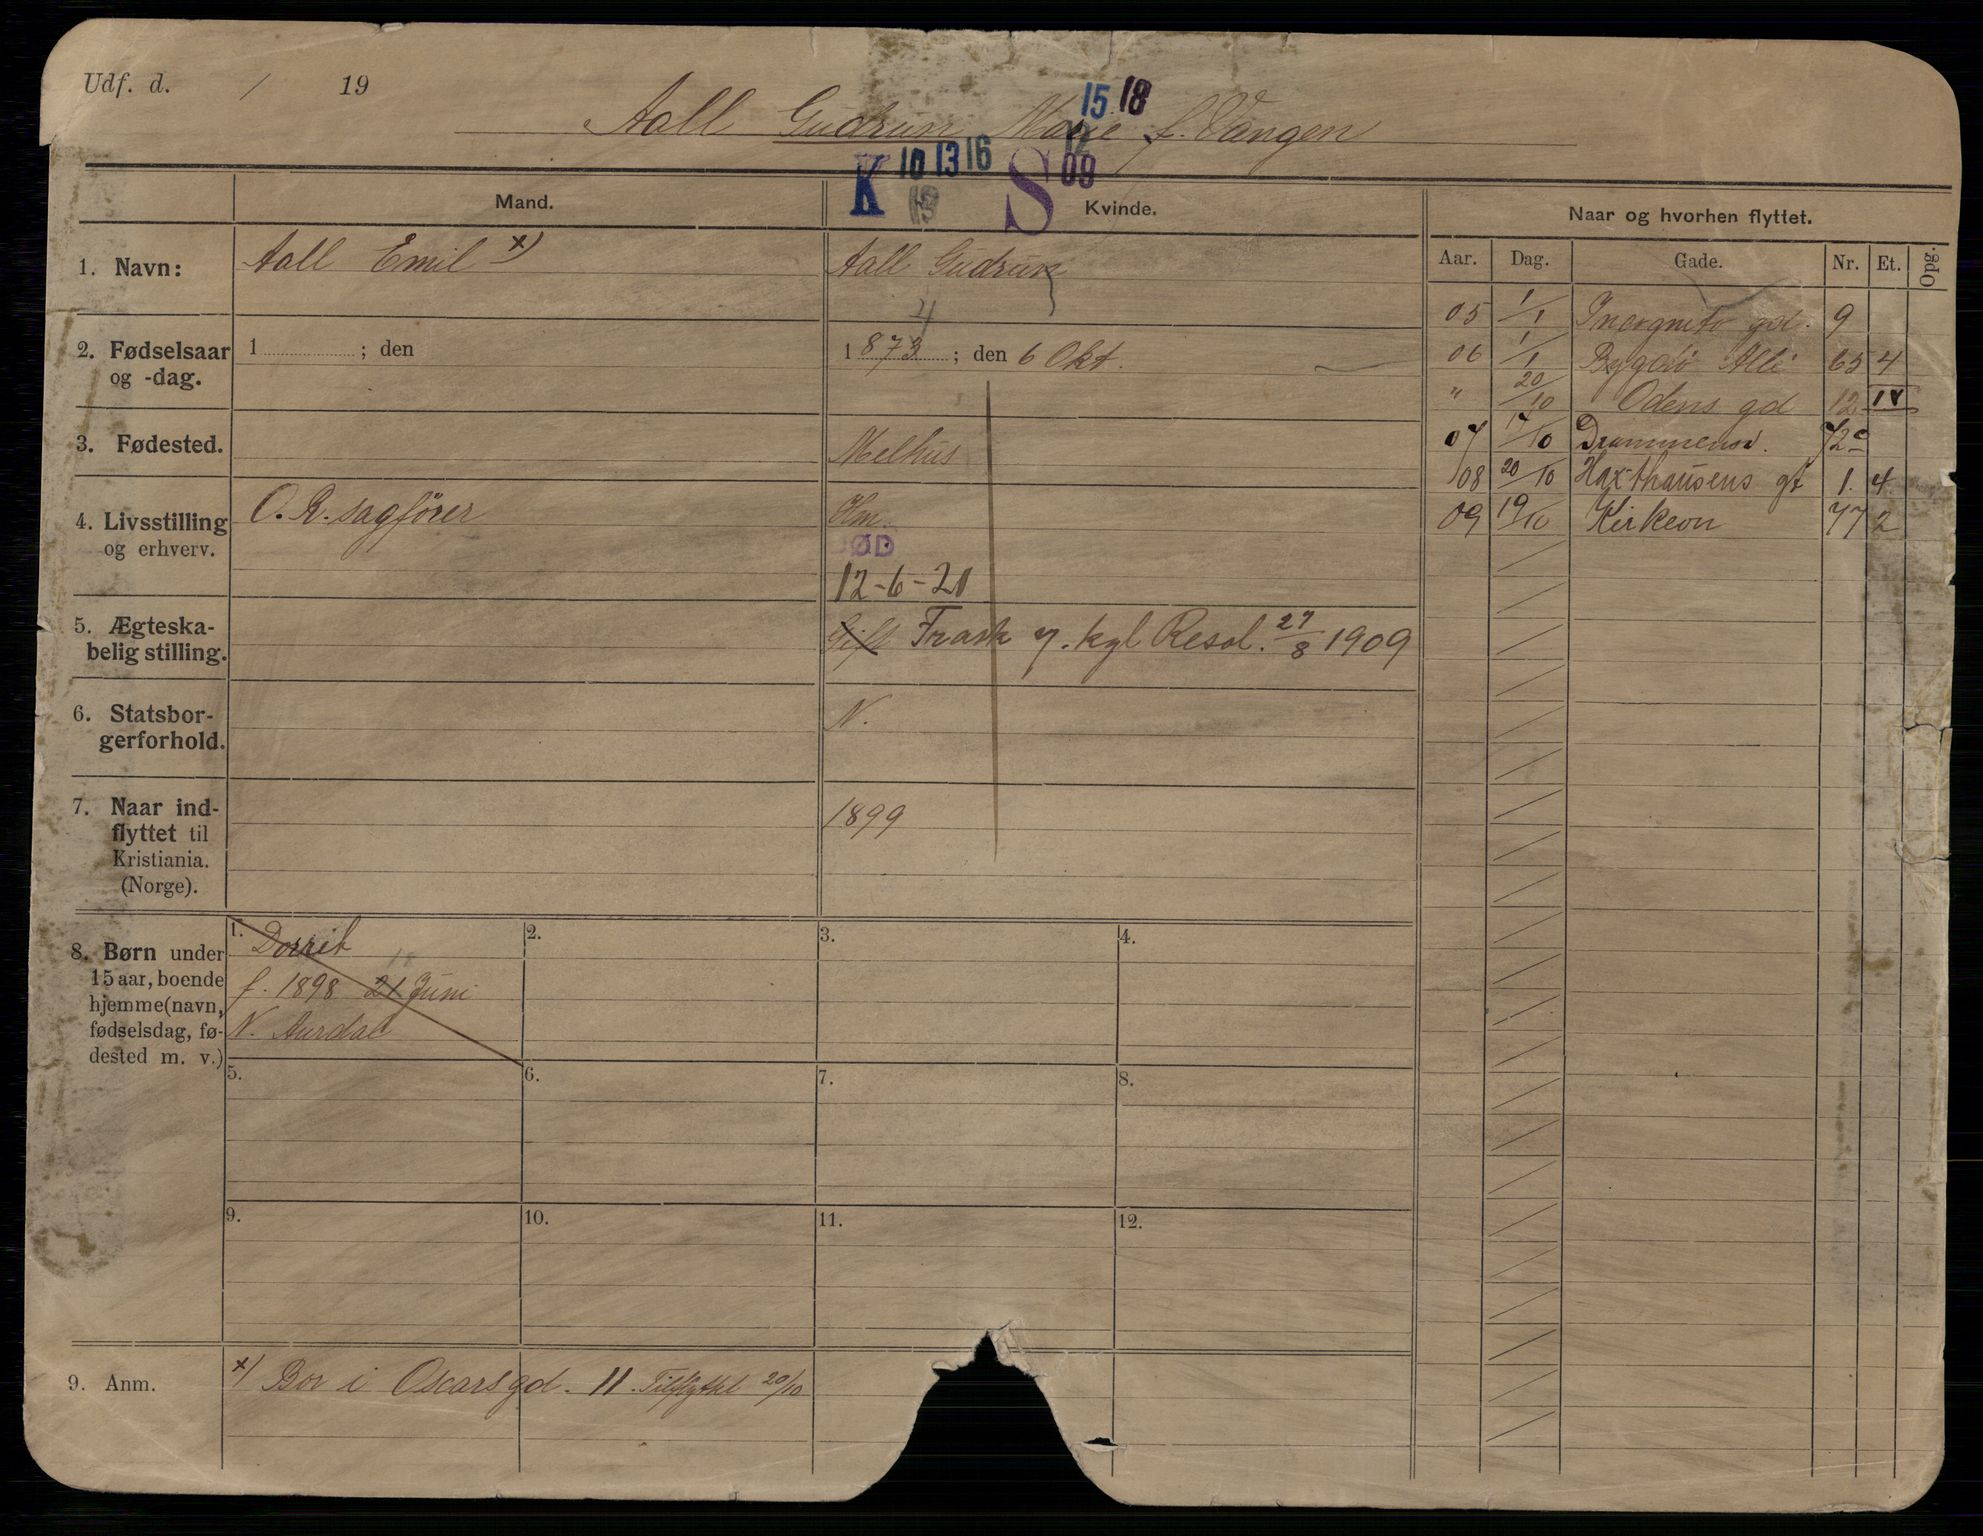 SAO, Oslo folkeregister, Registerkort, G/Gb/L0034: Kvinner, 1921